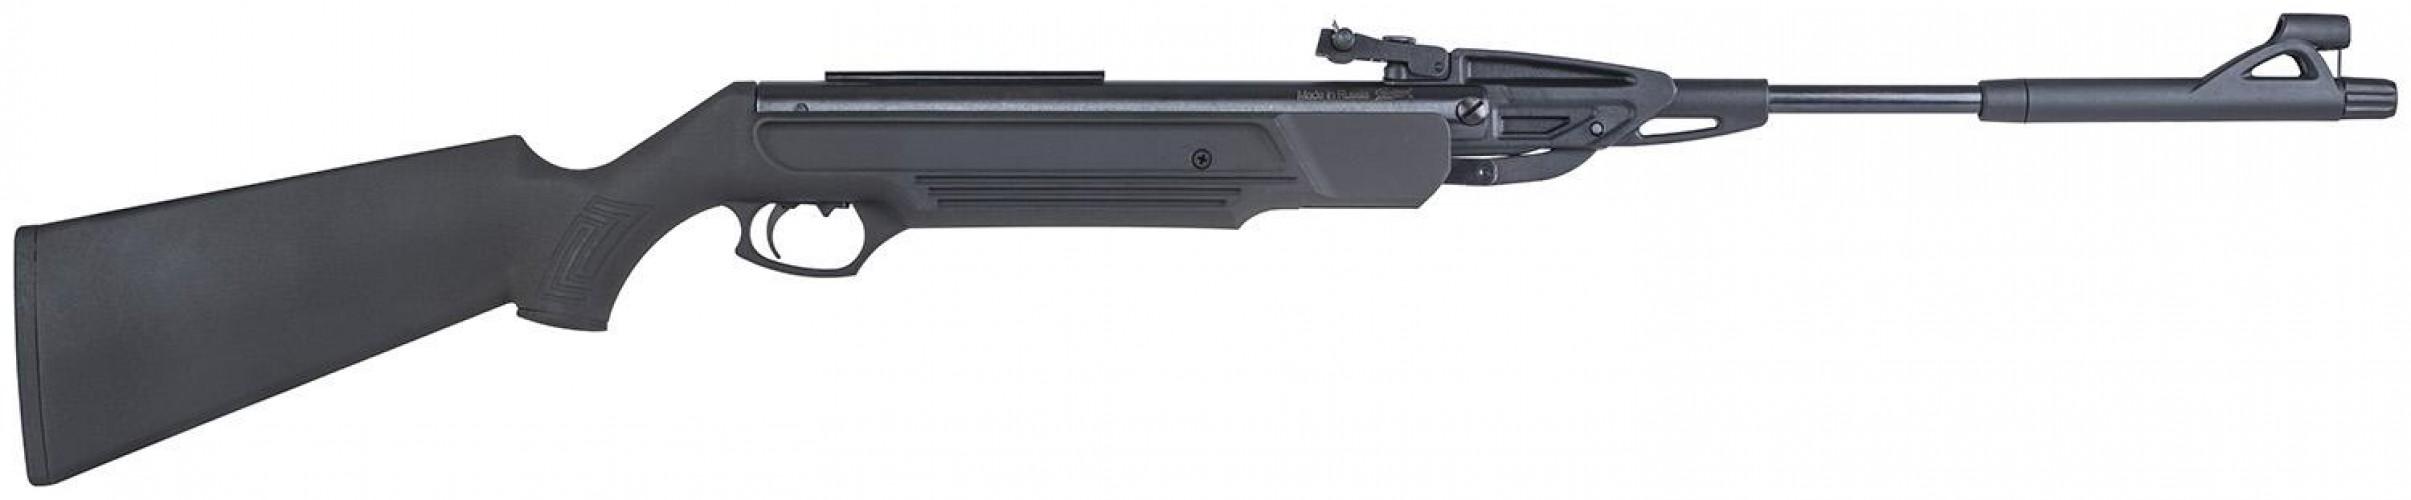 Пневматическая винтовка МР-512-22 - У 4,5 мм